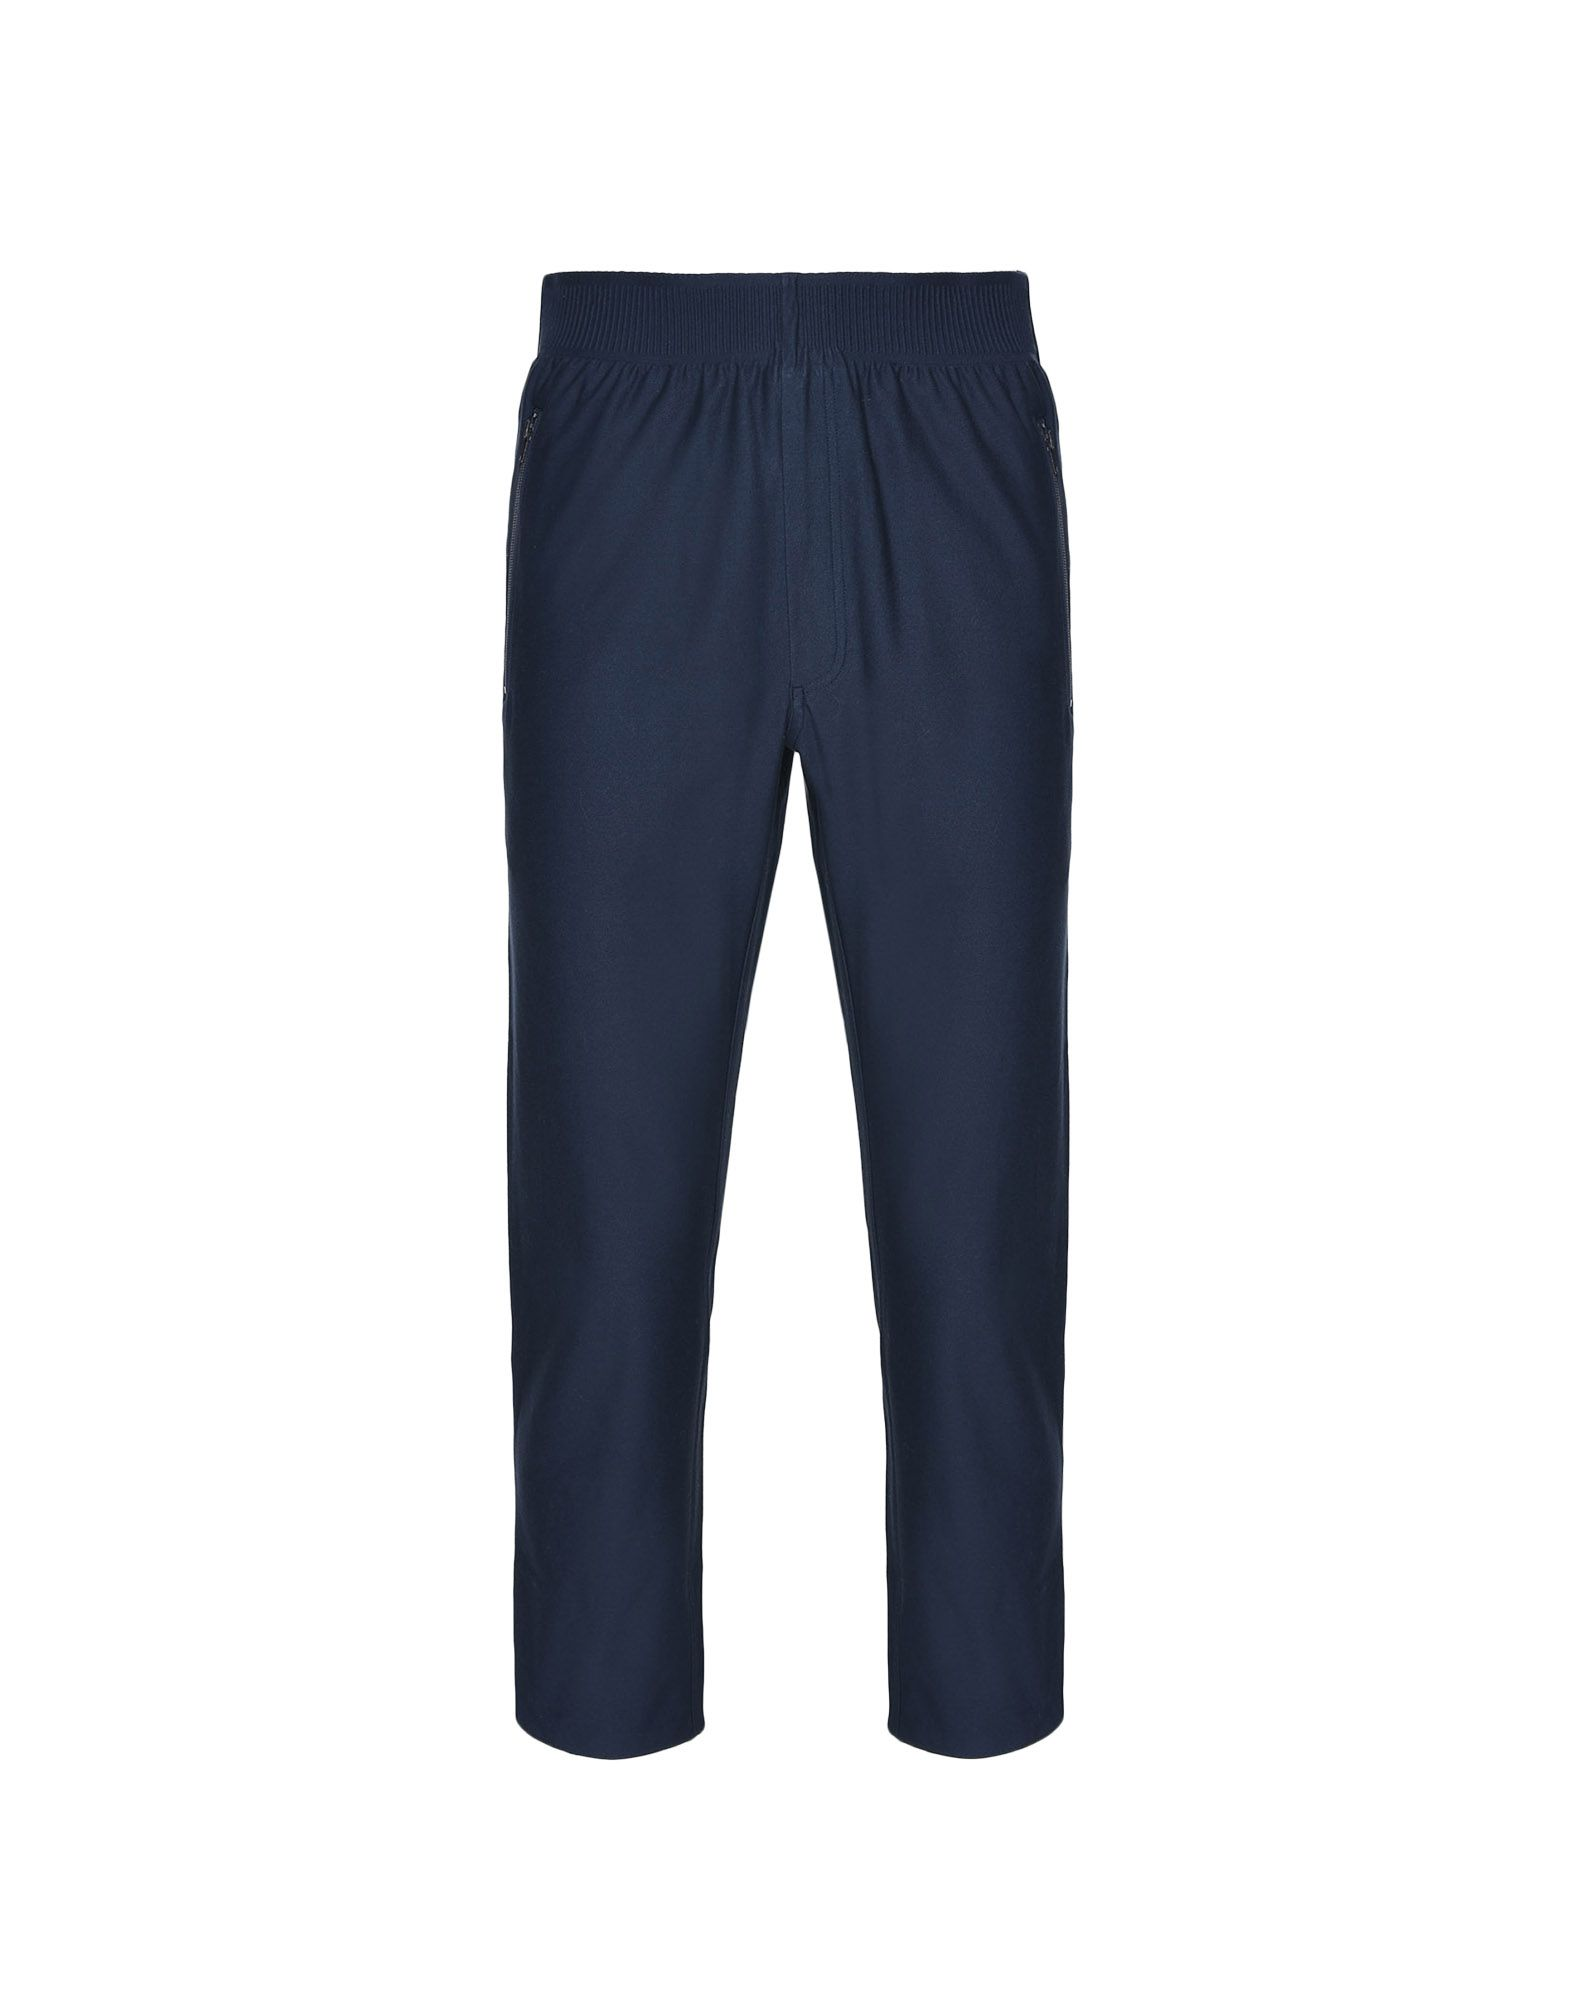 Y-3 Y-3 Twill Cropped Pants dreiviertellange Hose Herren f